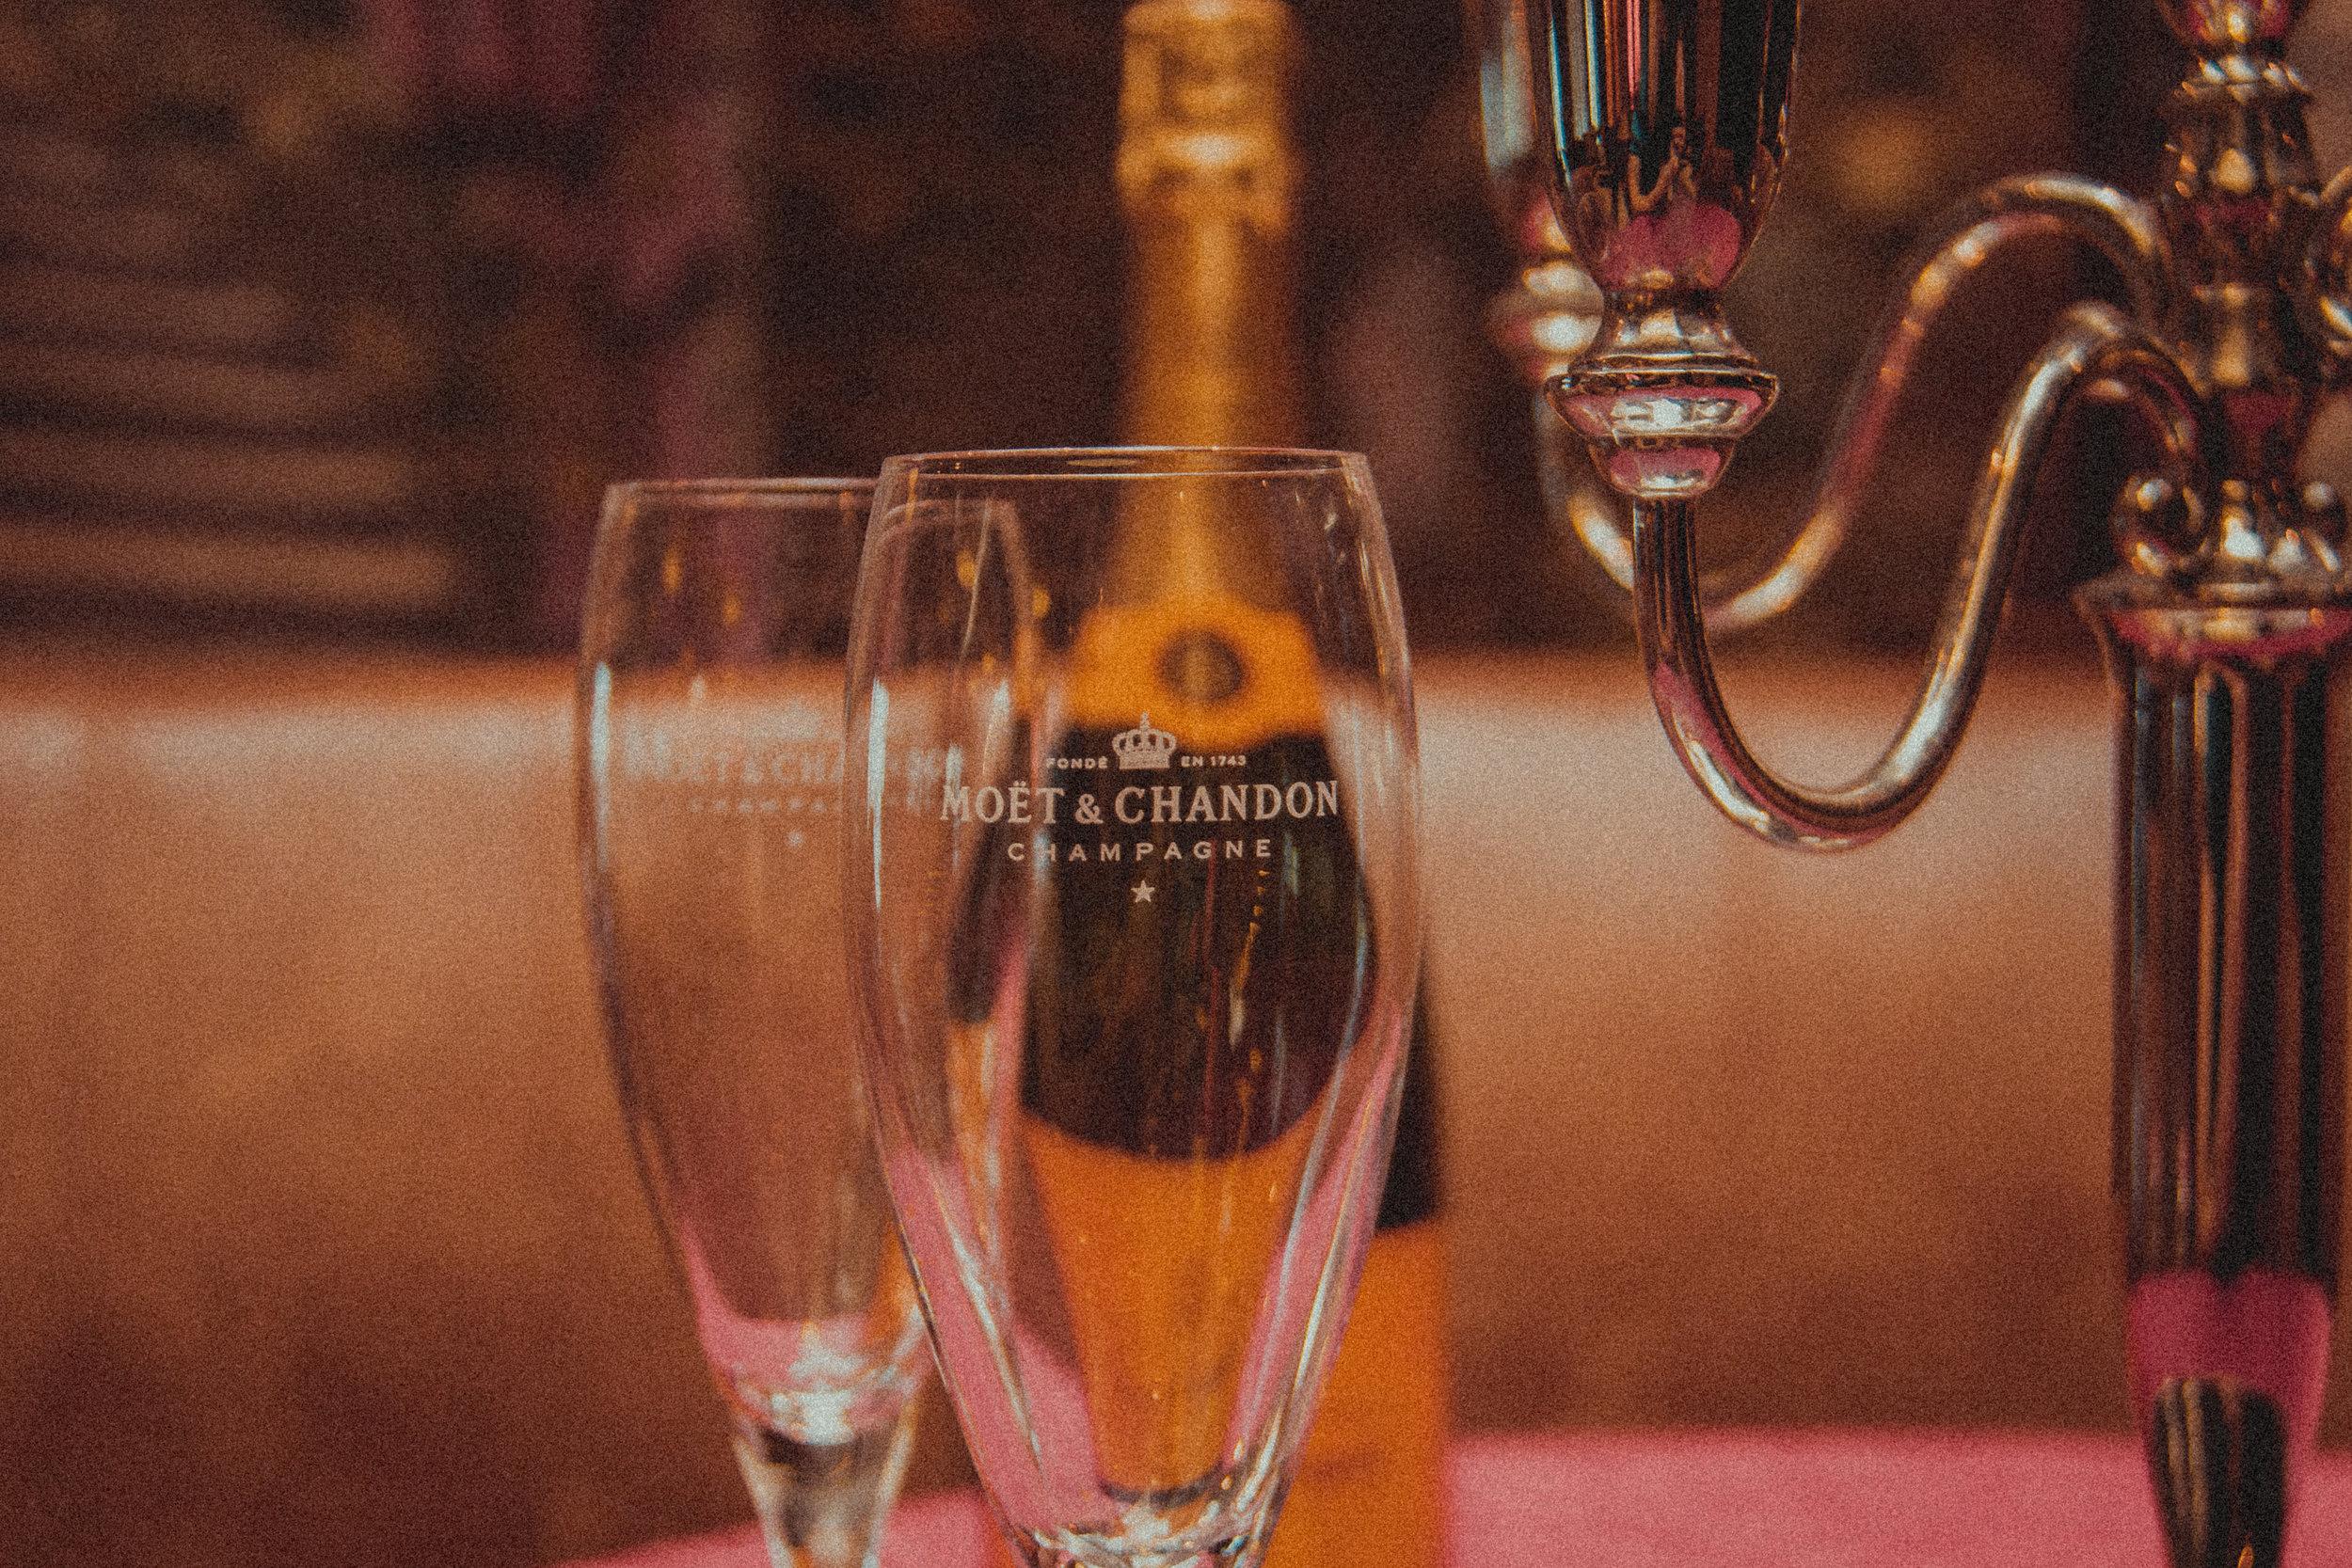 PASSED WHITE WINE & CHAMPAGNE - white wine, champagne, water, rentals, staffstarting at $31 per person